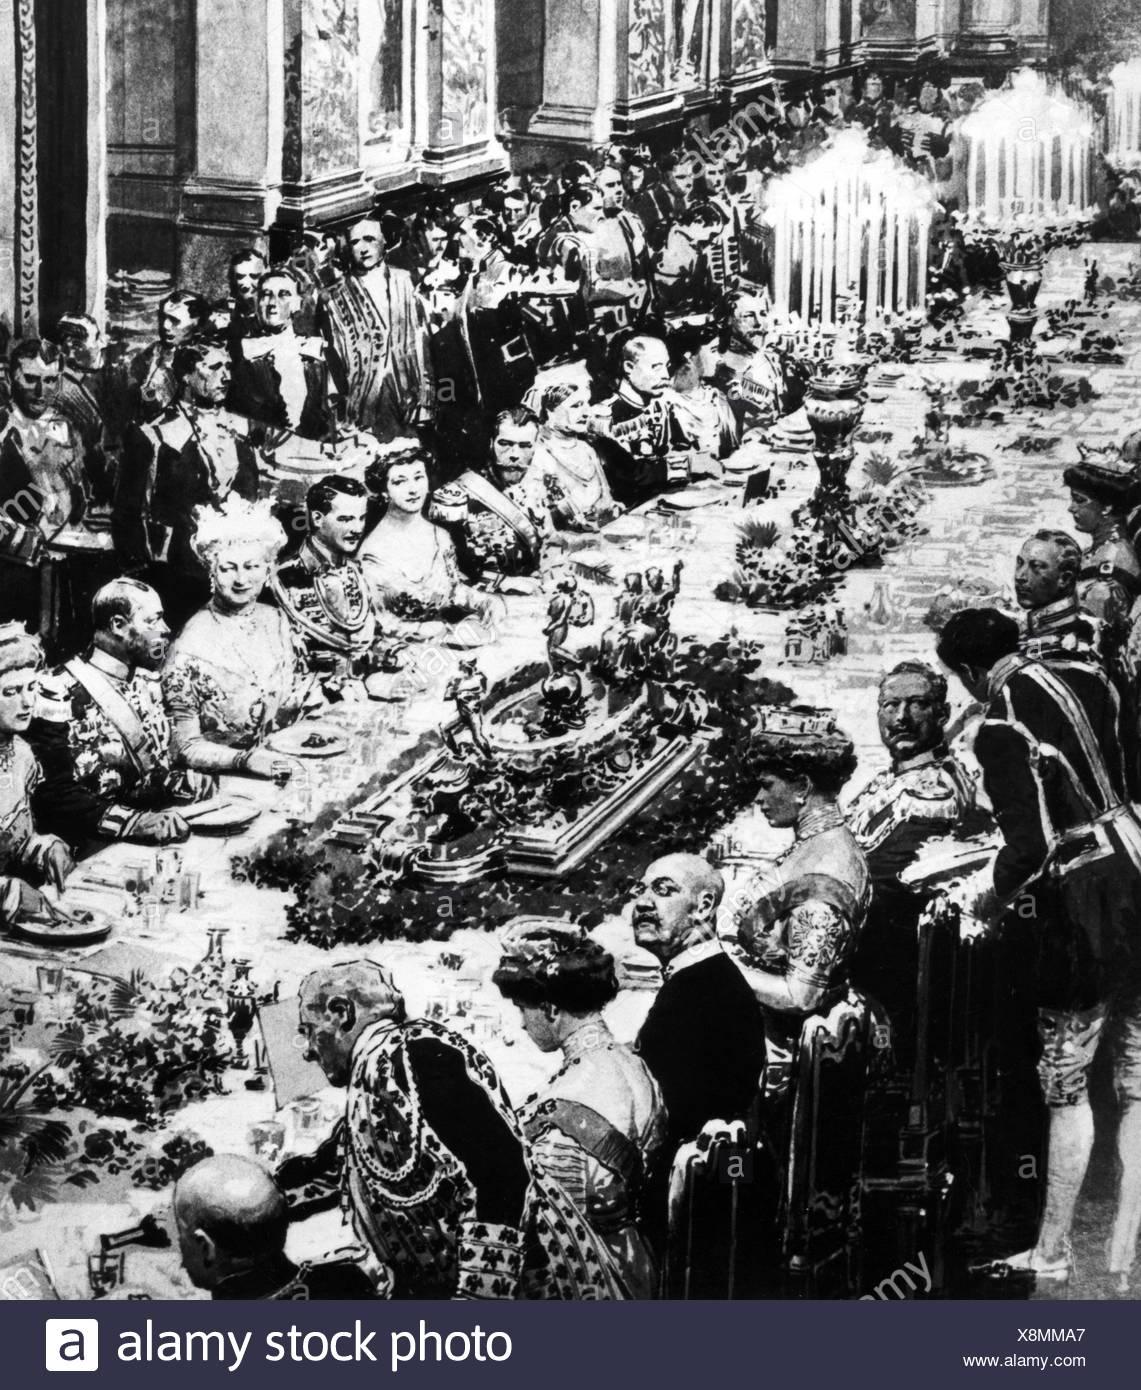 Ernest Augustus III., 17.11.1887 - 30. 1.1953, Duke of Brunswick 2.11.1913 - 8.11.1918, wedding with Princess Victoria Louise of Stockbild